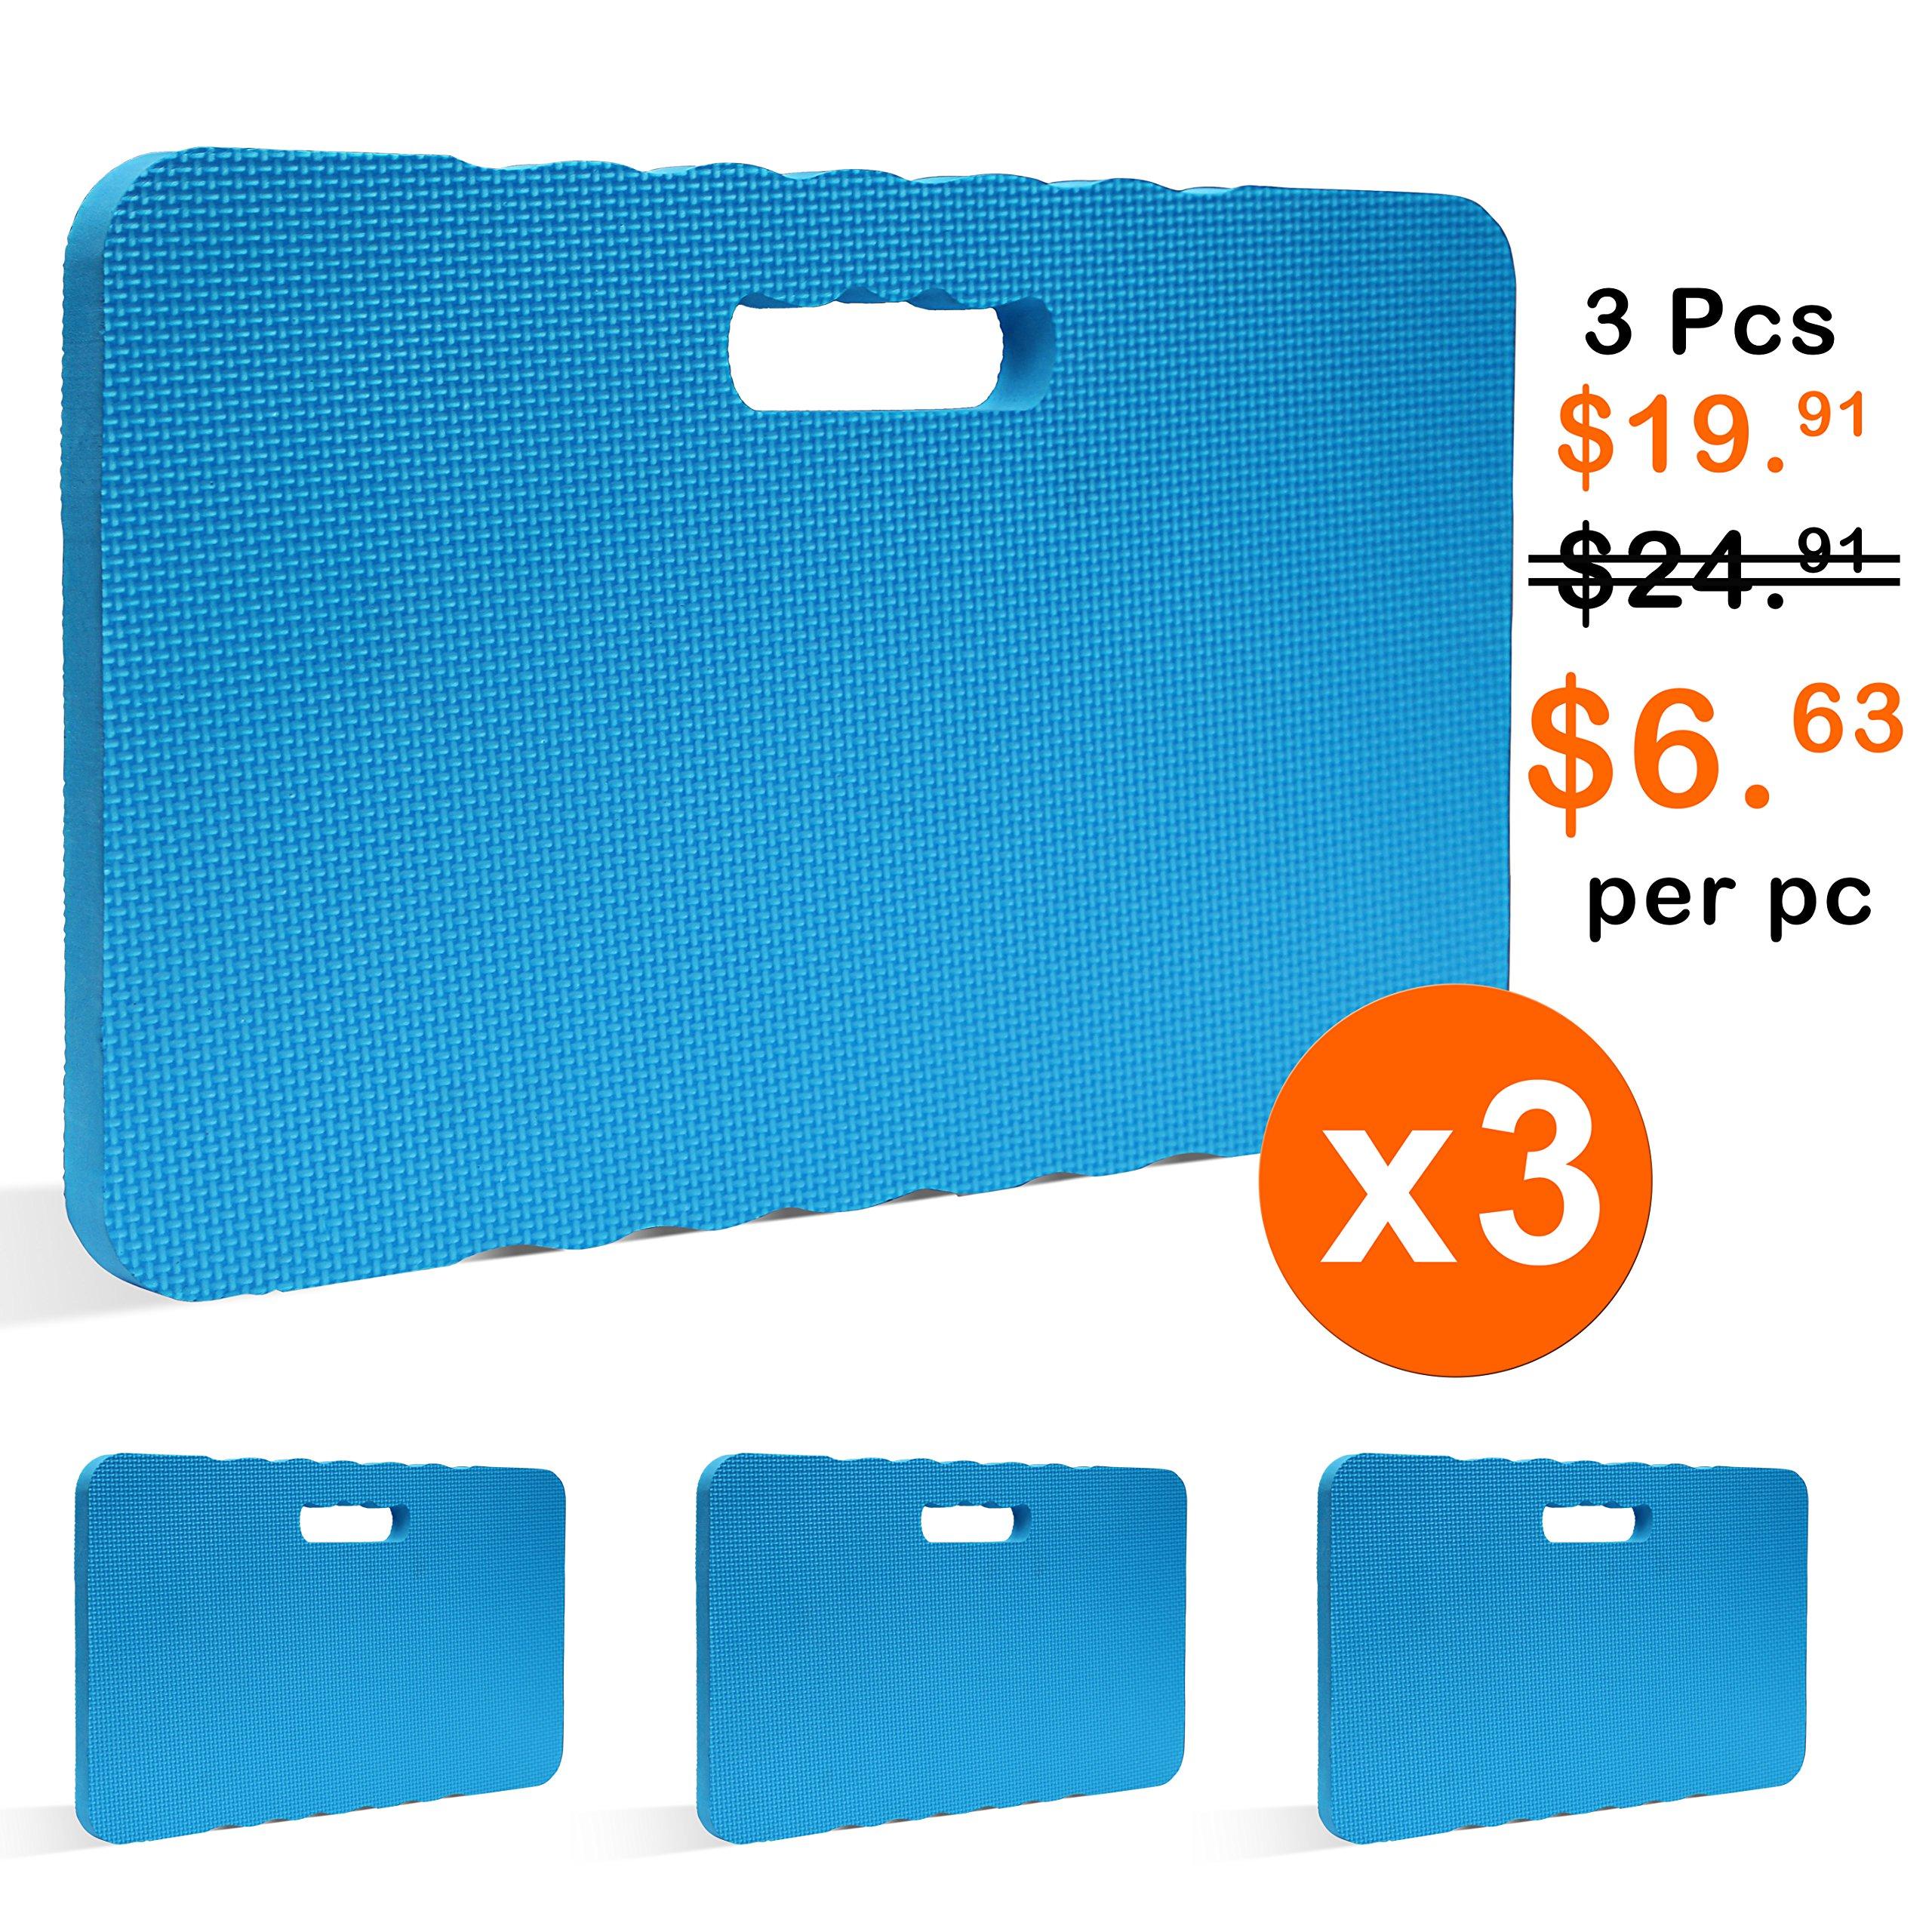 Gardzen 3 Pack Garden Kneeling Pad - For Gardening, Baby Bath, Yoga, Pilates, Exercise, 18''x11''x1'', Blue